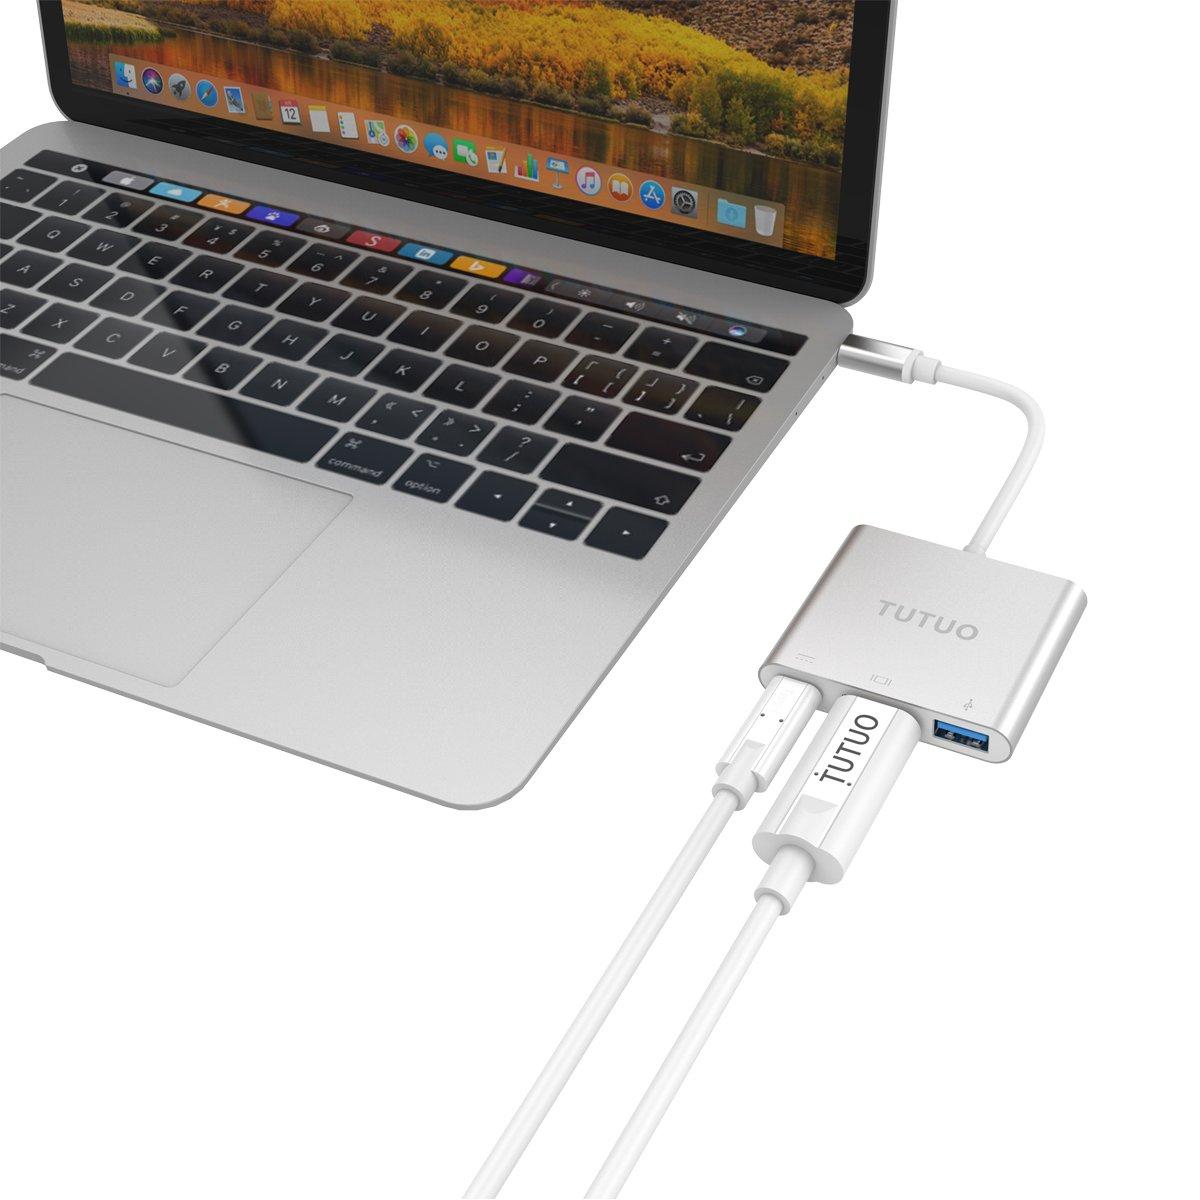 TUTUO Nintendo Switch Dock USB Tipo C a HDMI Adaptador USB Hub Convertidor Cable USB 3.0 y USB C PD (Power Delivery) Hub para Nintendo Switch, Macbook Pro 2017 2016, Samsung Galaxy